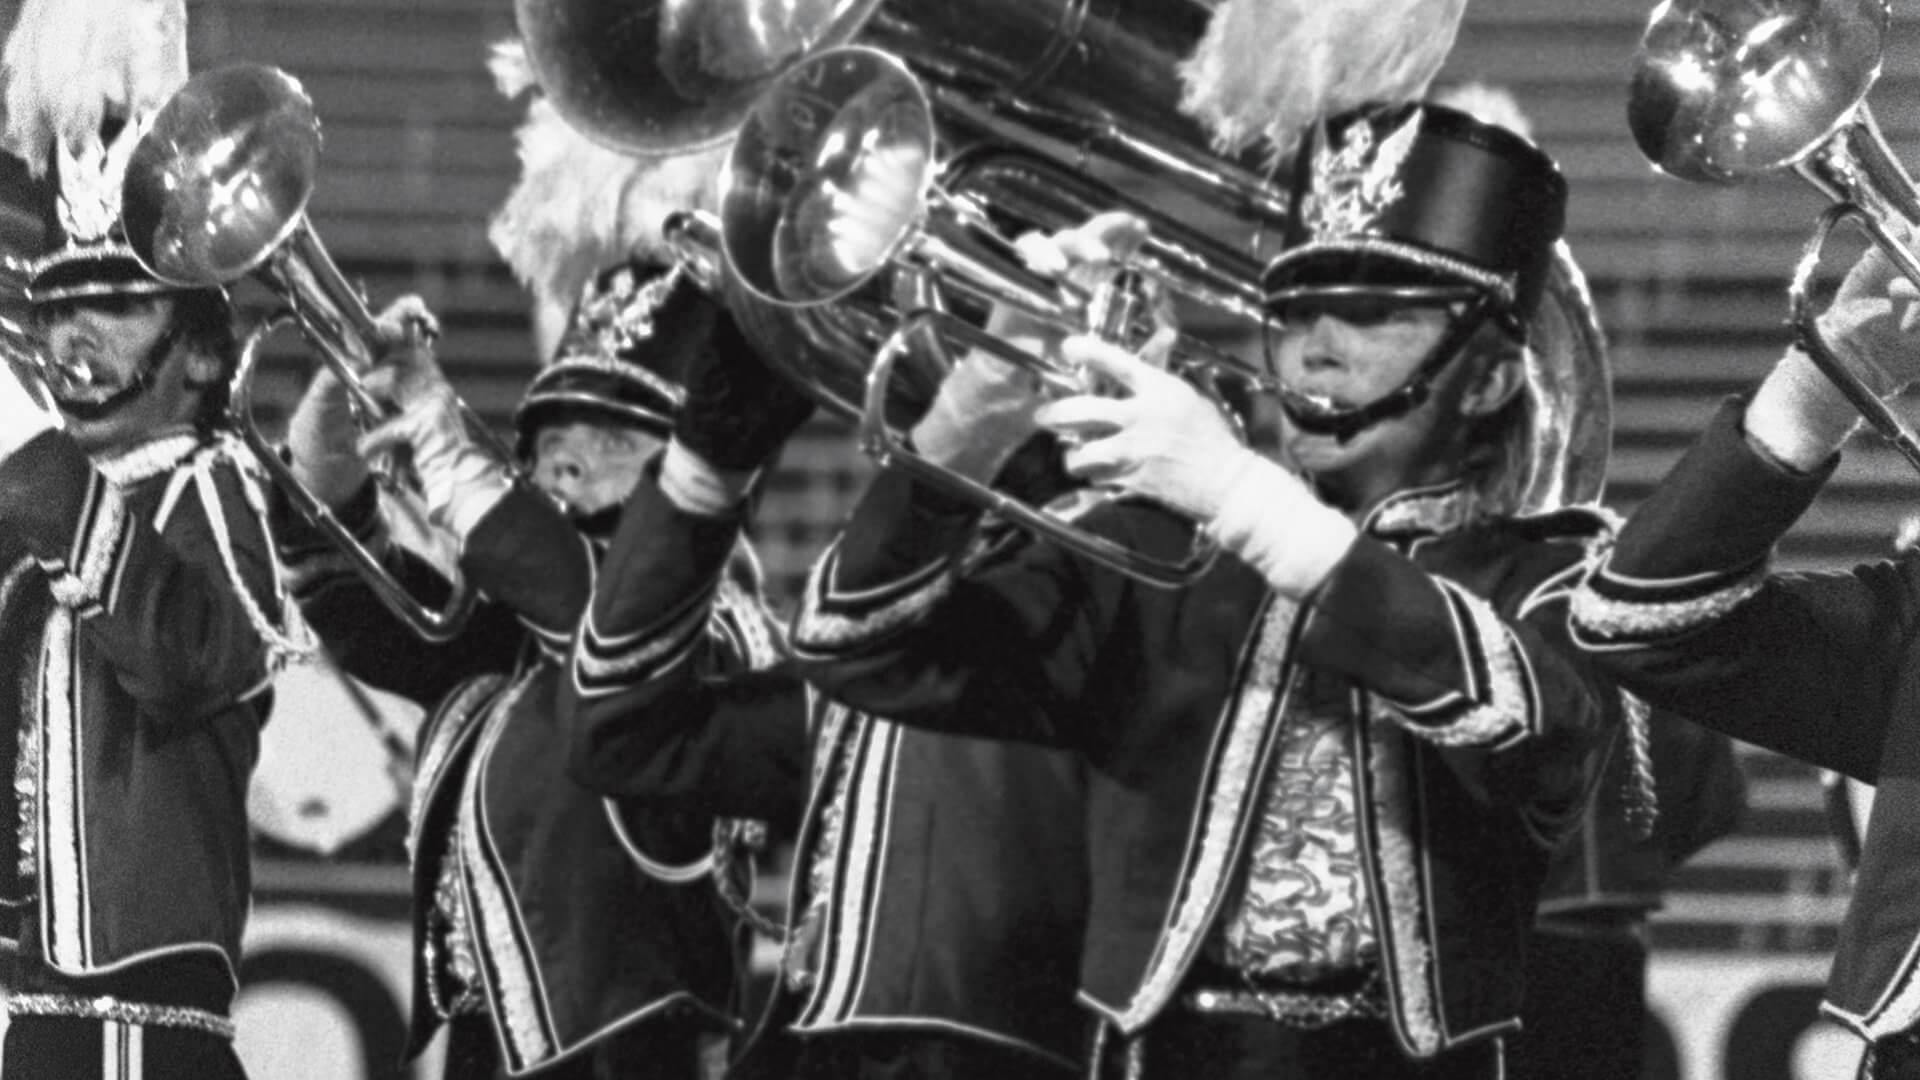 Kanstul?s innovative brass instruments set the drum corps standard for decades